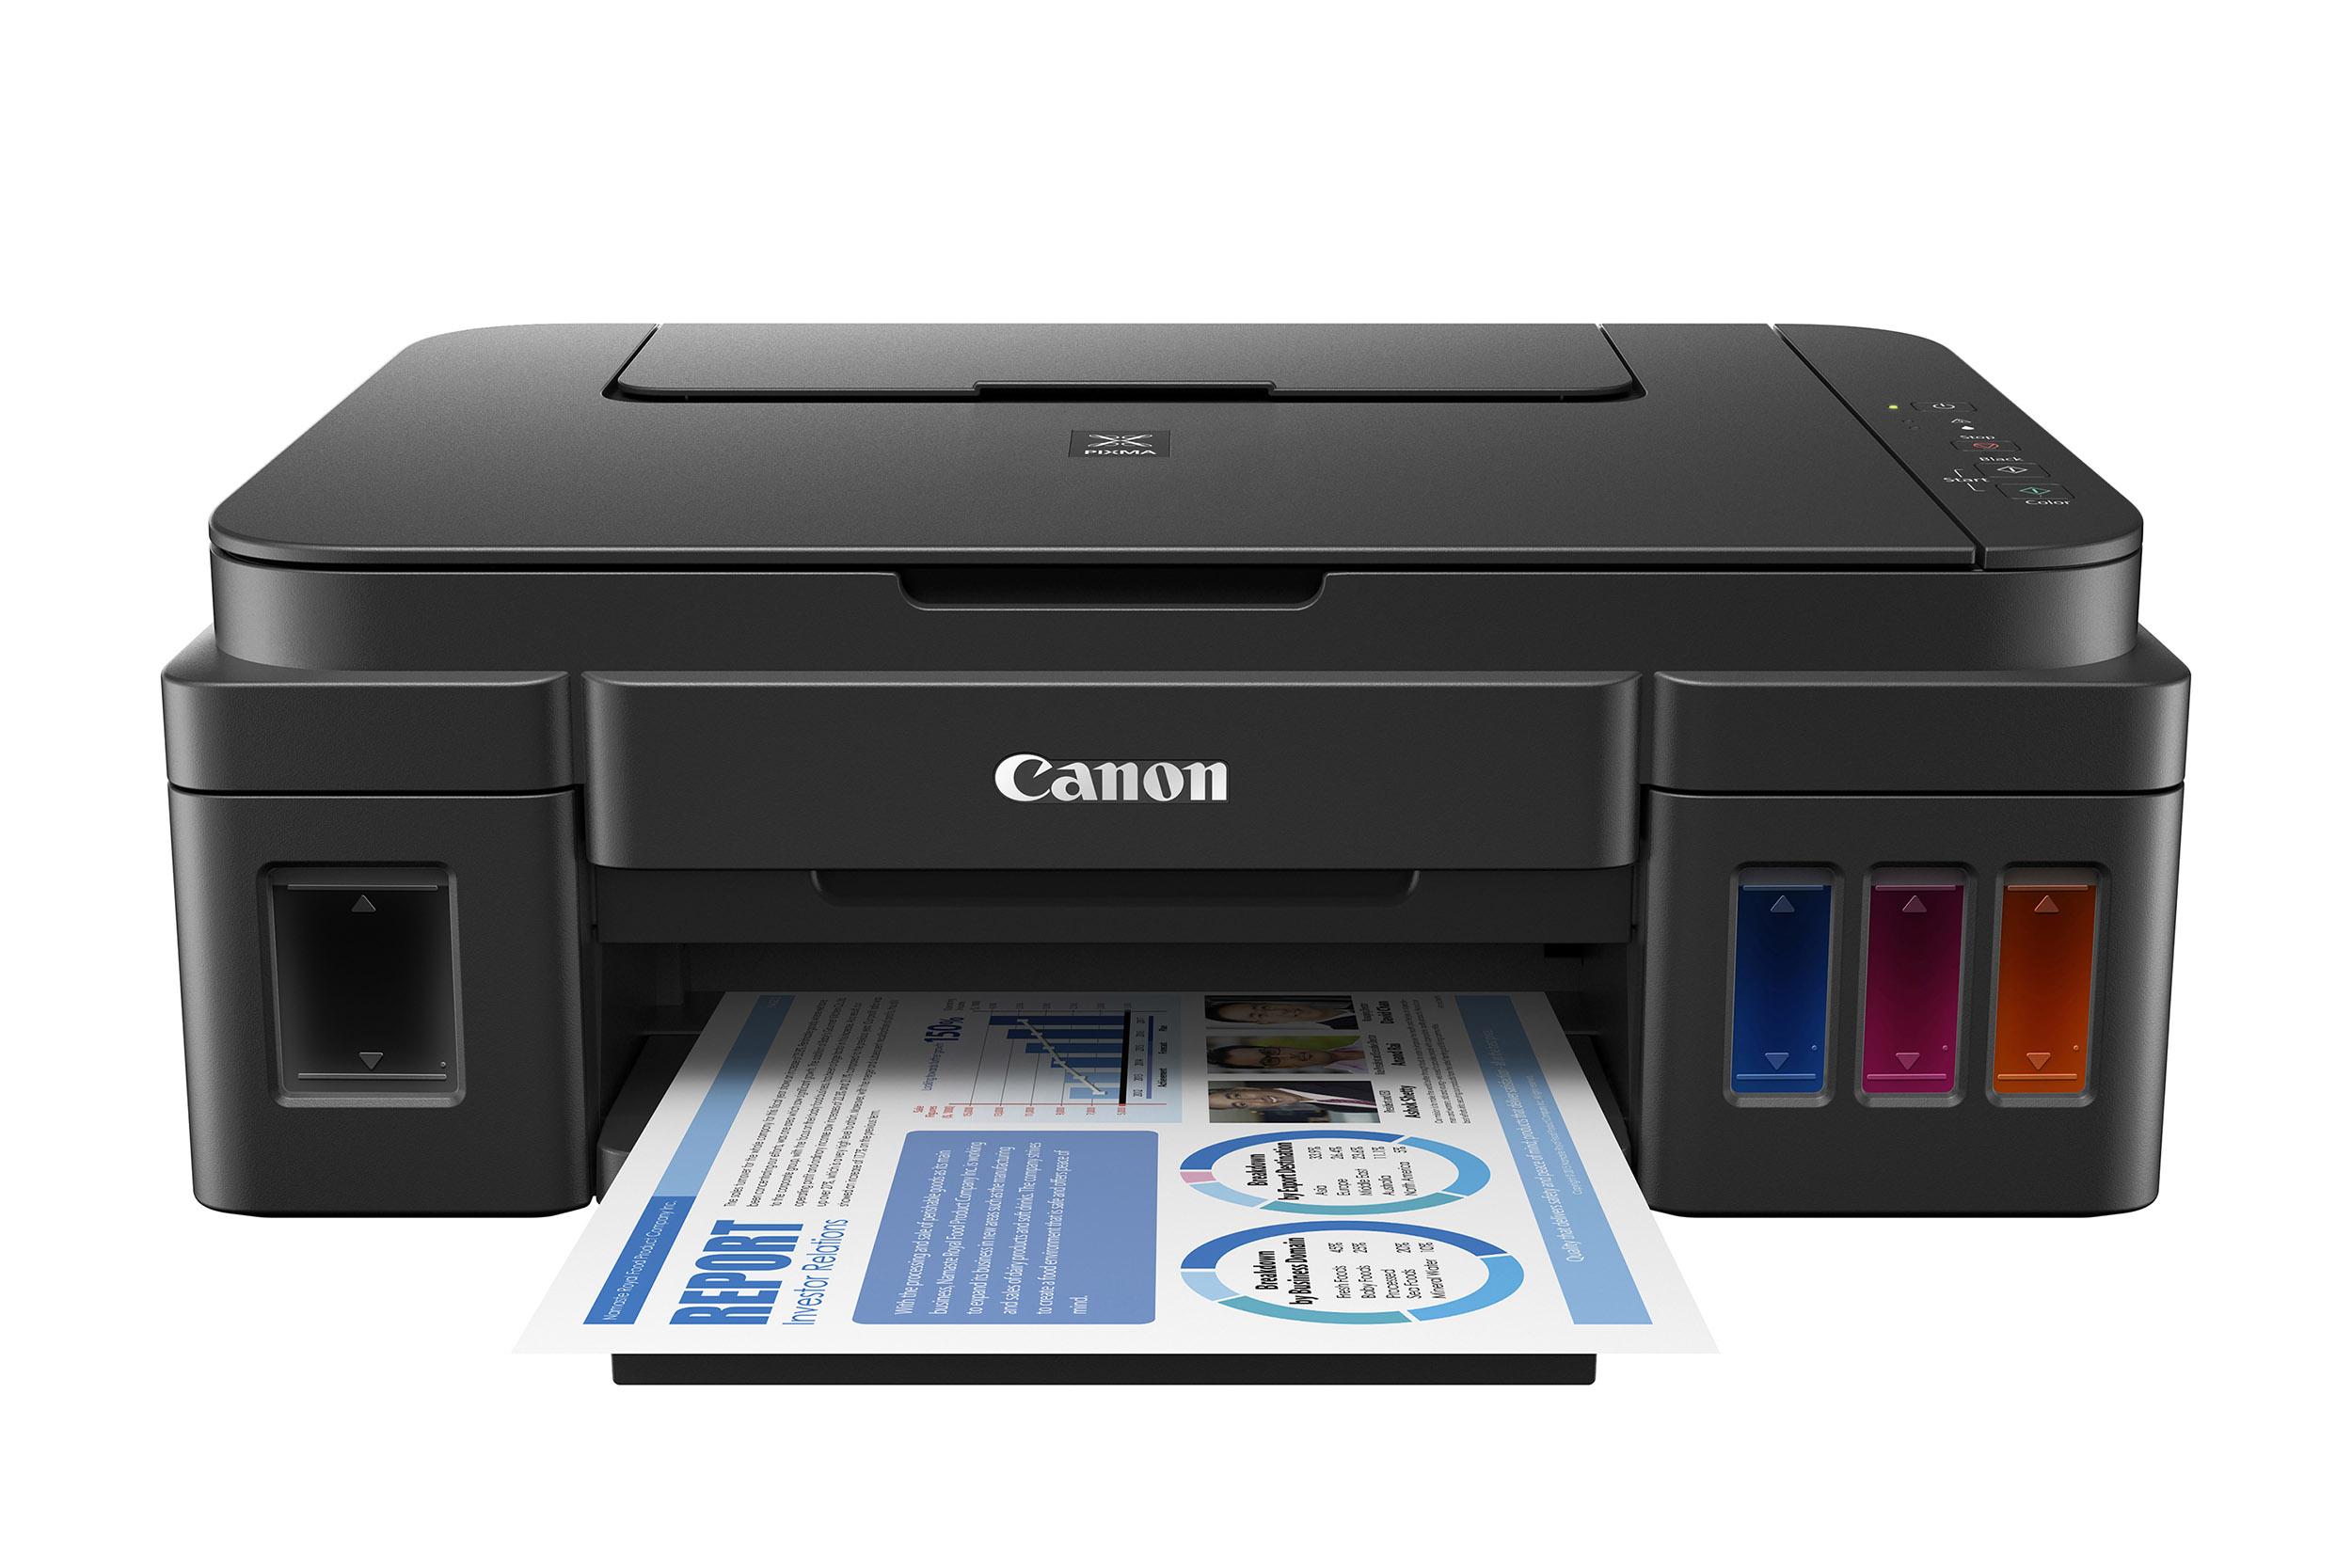 Peluncuran printer Canon Pixma seri G